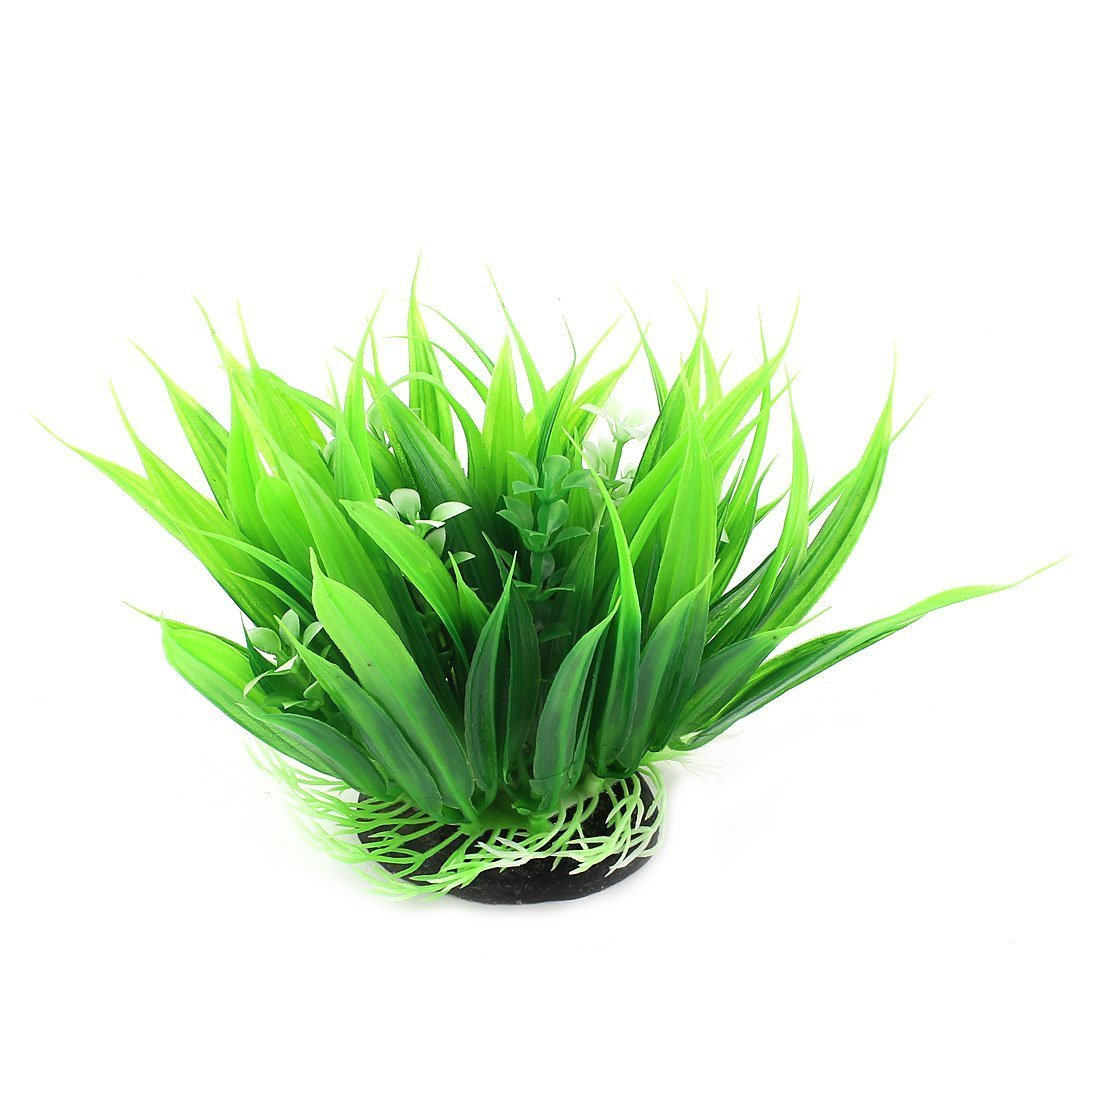 1Pc Aquarium Artificial Water Grass Plant Decor 11cm High Green White